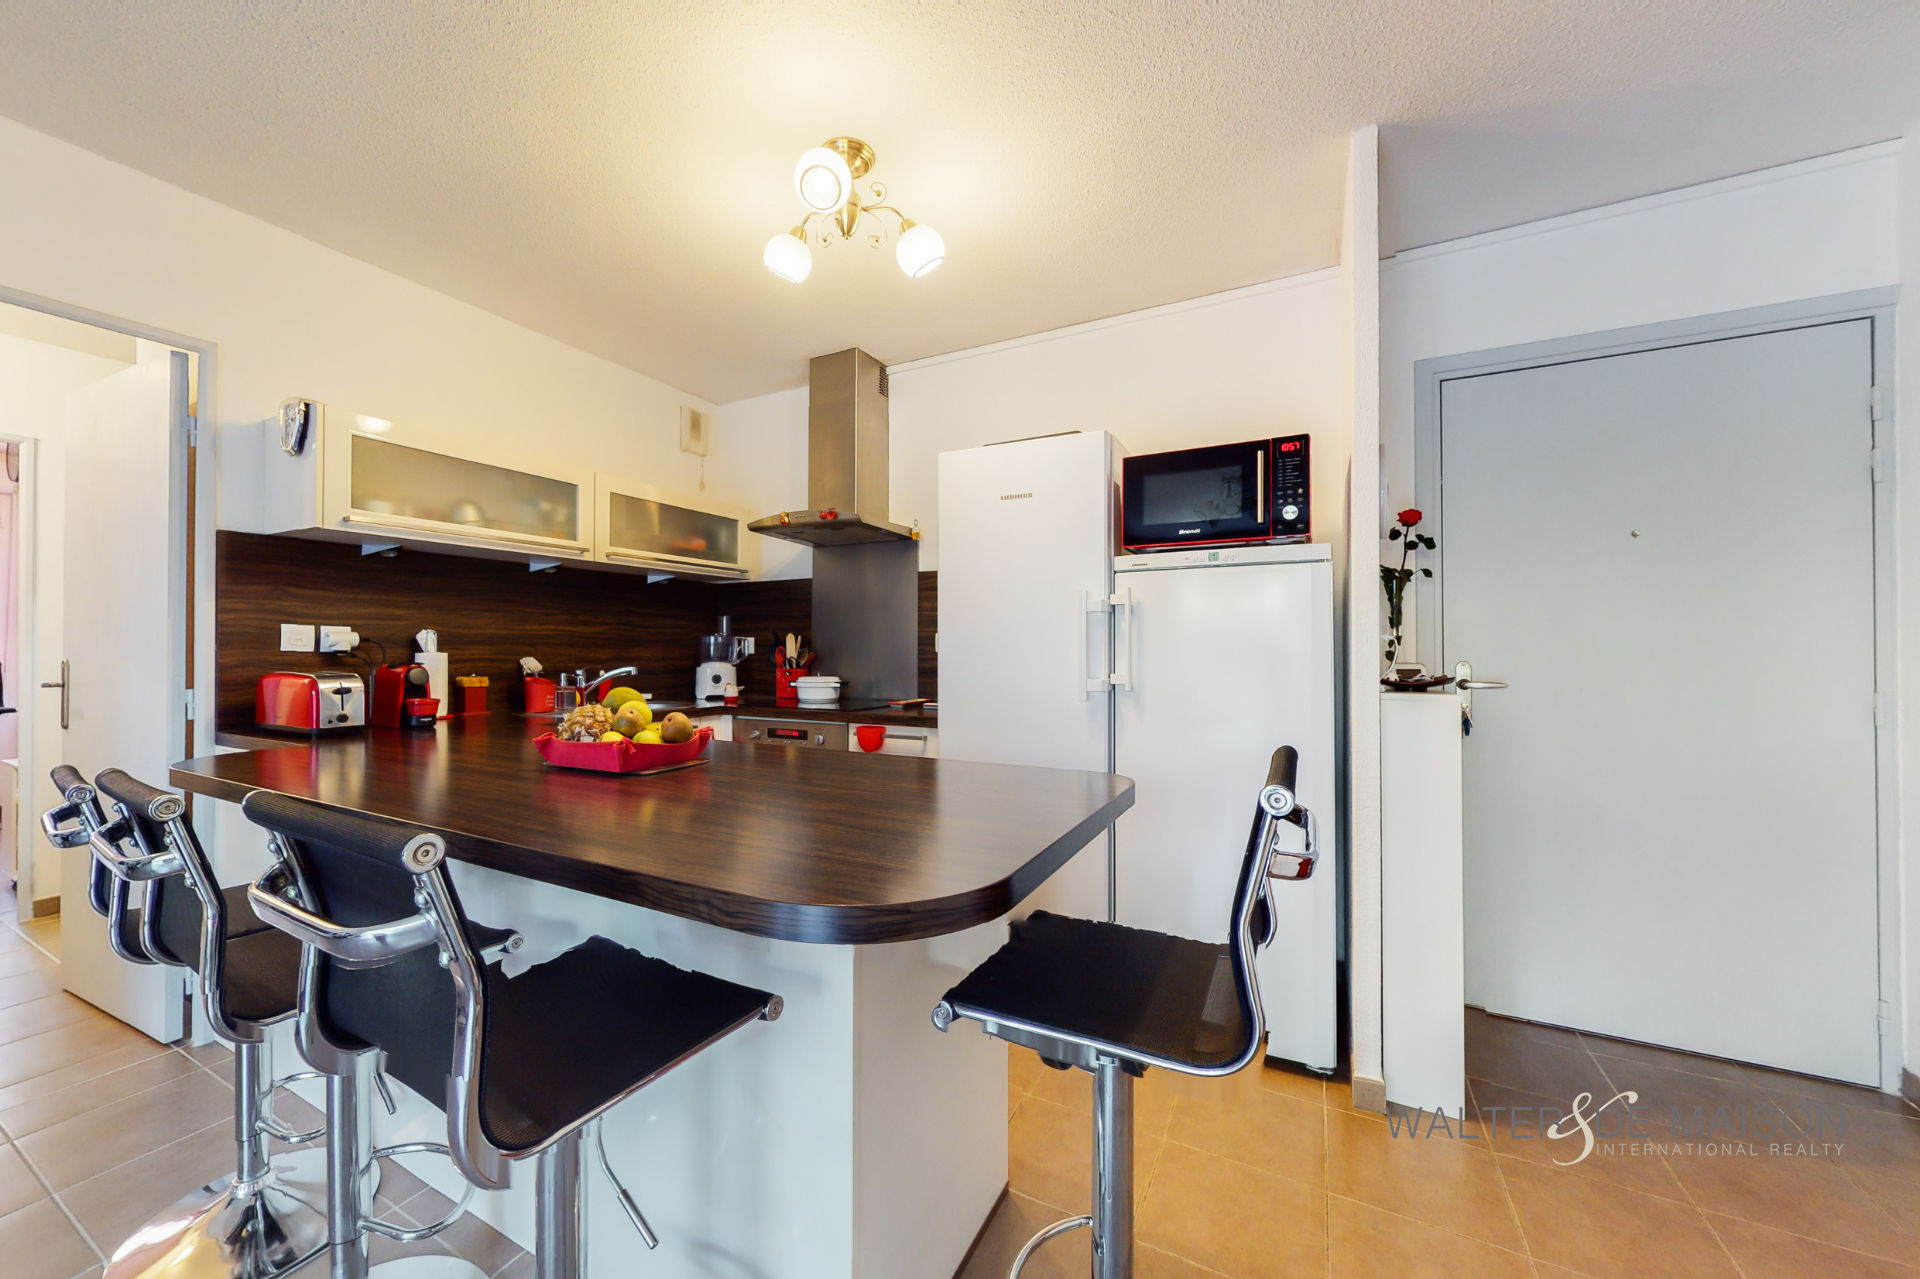 Appartement 4 pièce(s) 74 m²                         13600 LA CIOTAT